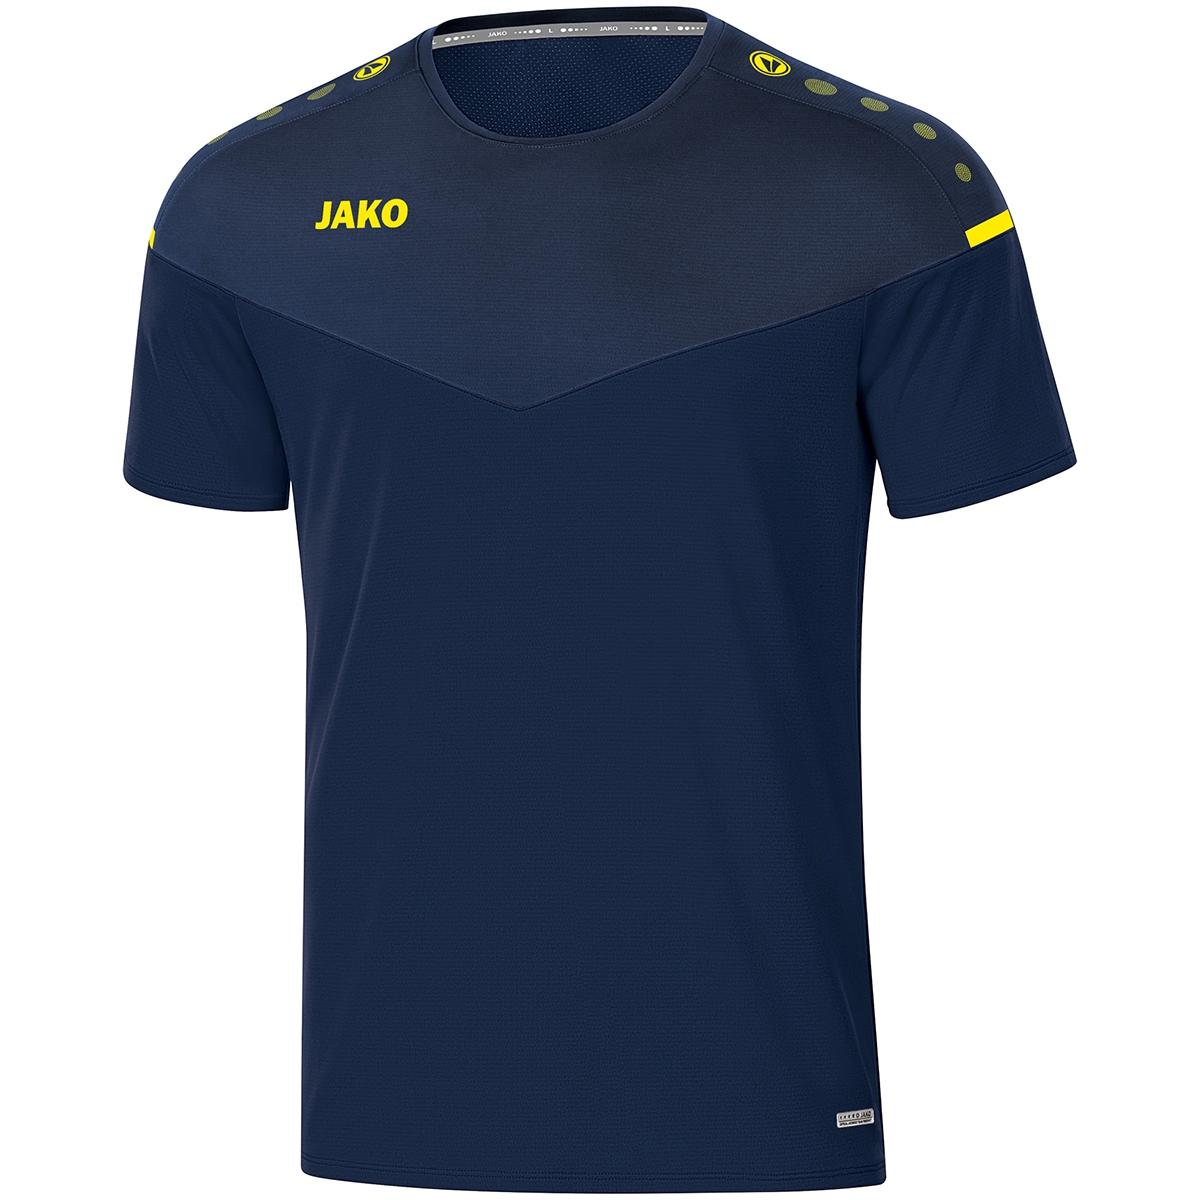 T-Shirt Jako Champ 2.0 Herren SV LA Hoyerswerda